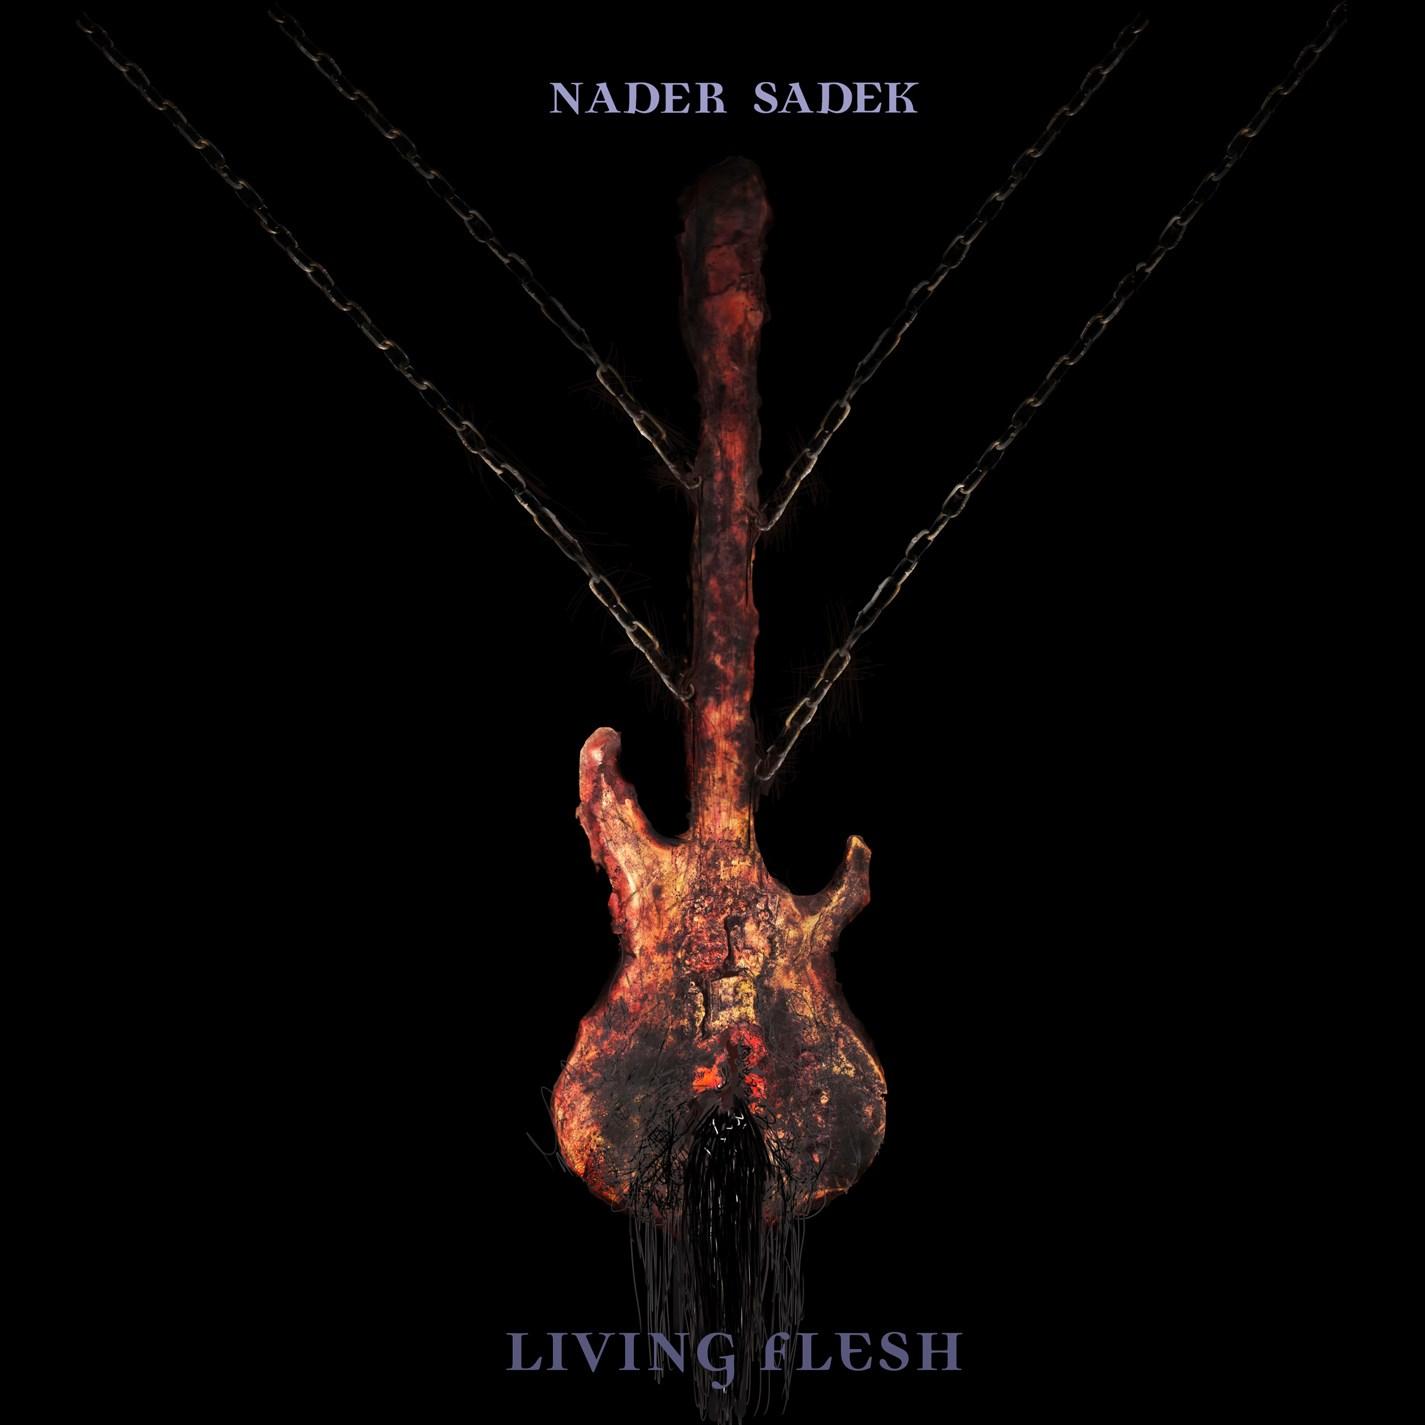 Nader Sadek: Living Flesh